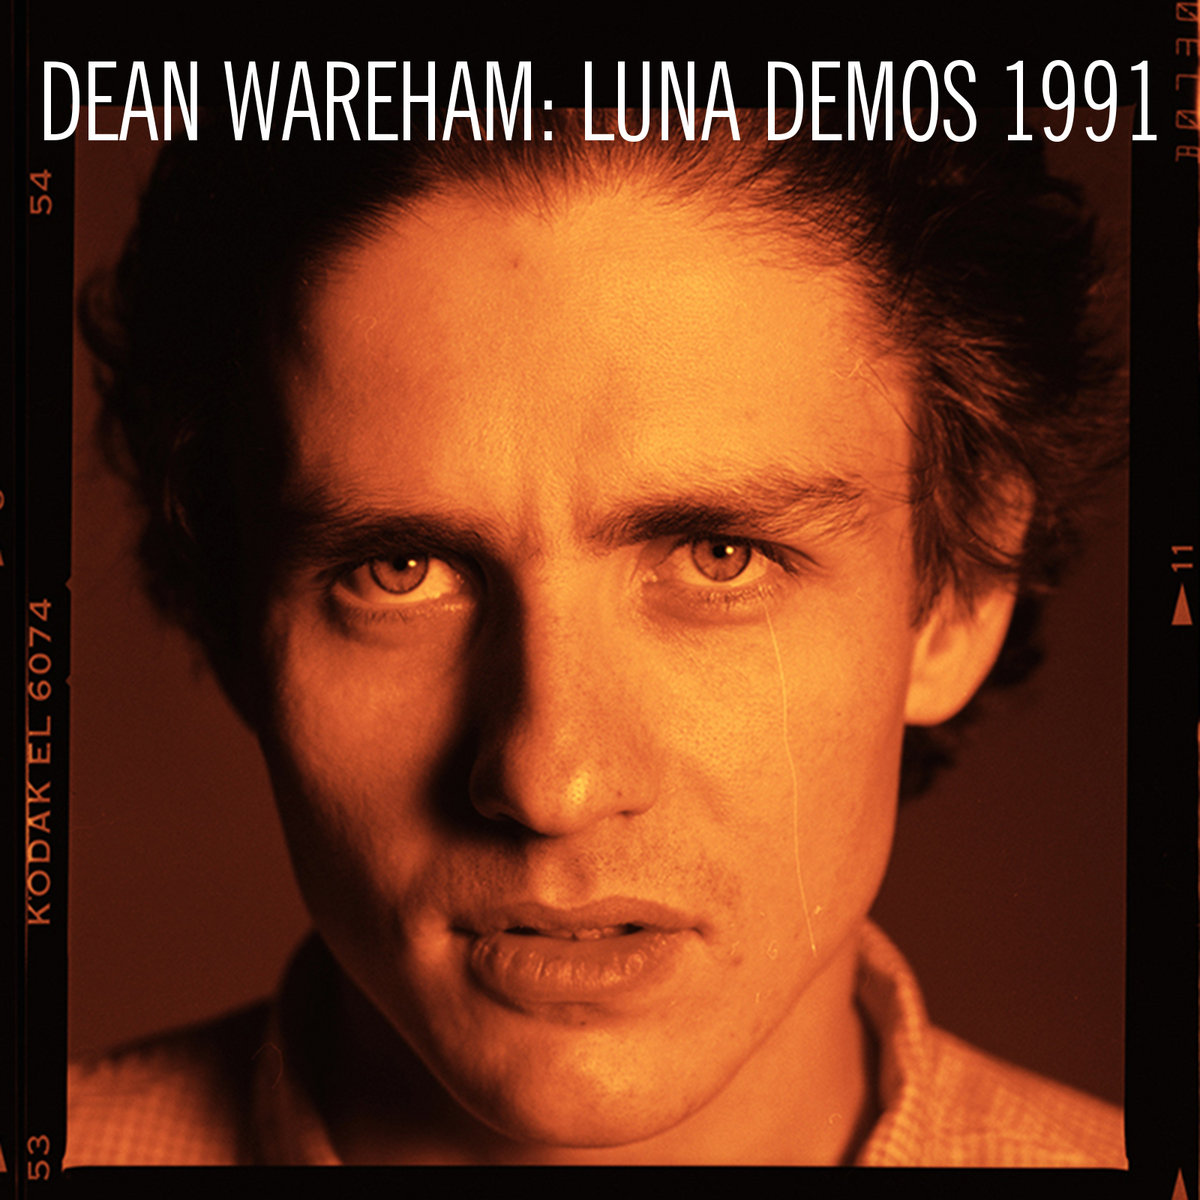 Dean Wareham: Luna Demos 1991